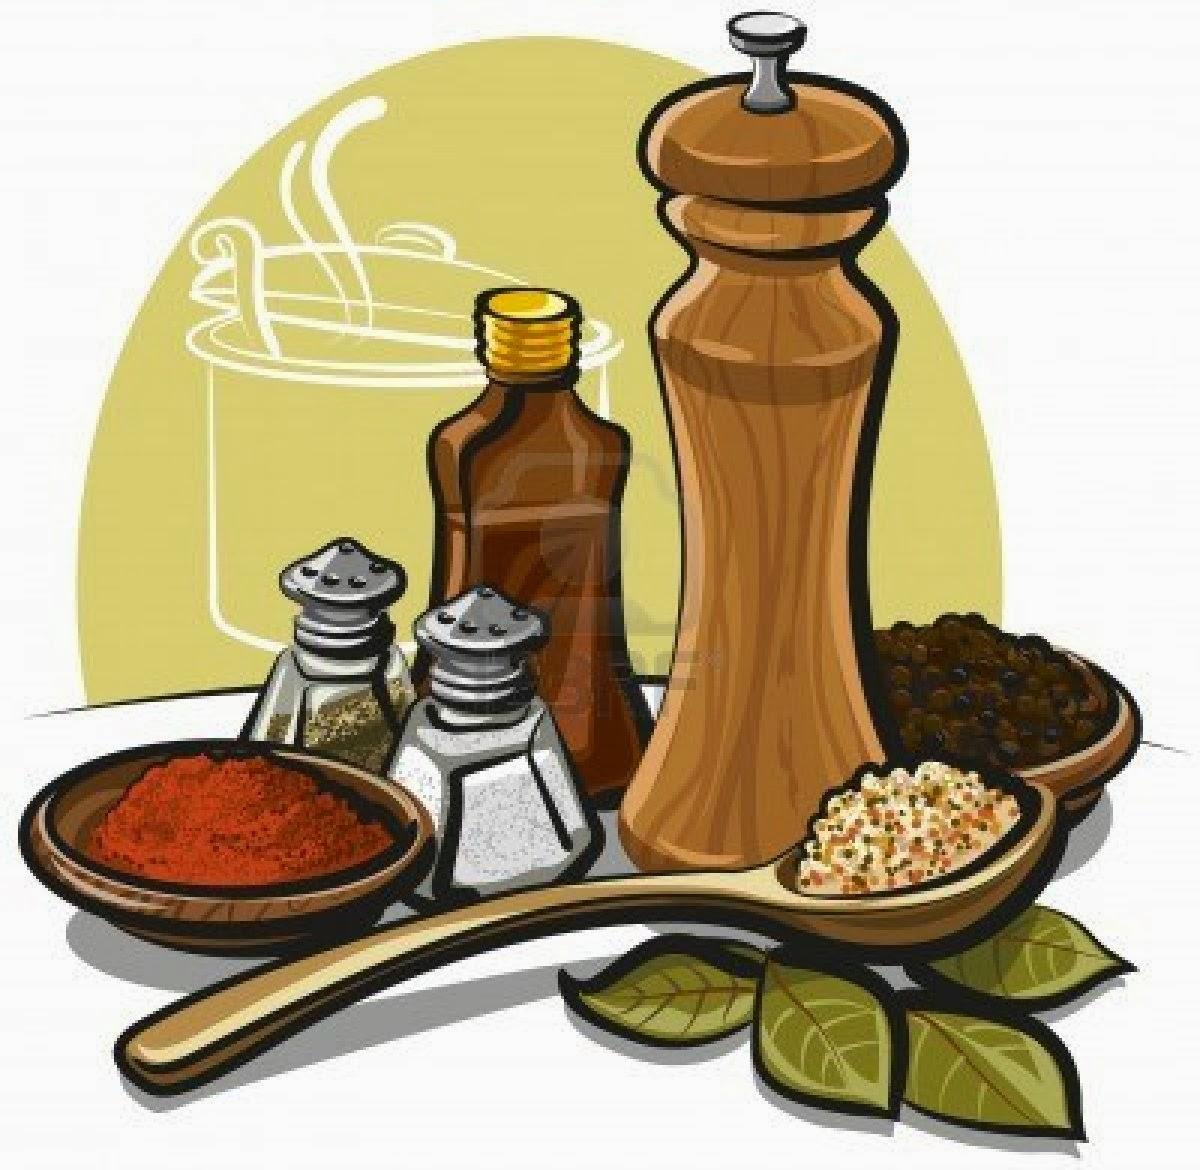 Spices+Clip+Art Spices Clip Art